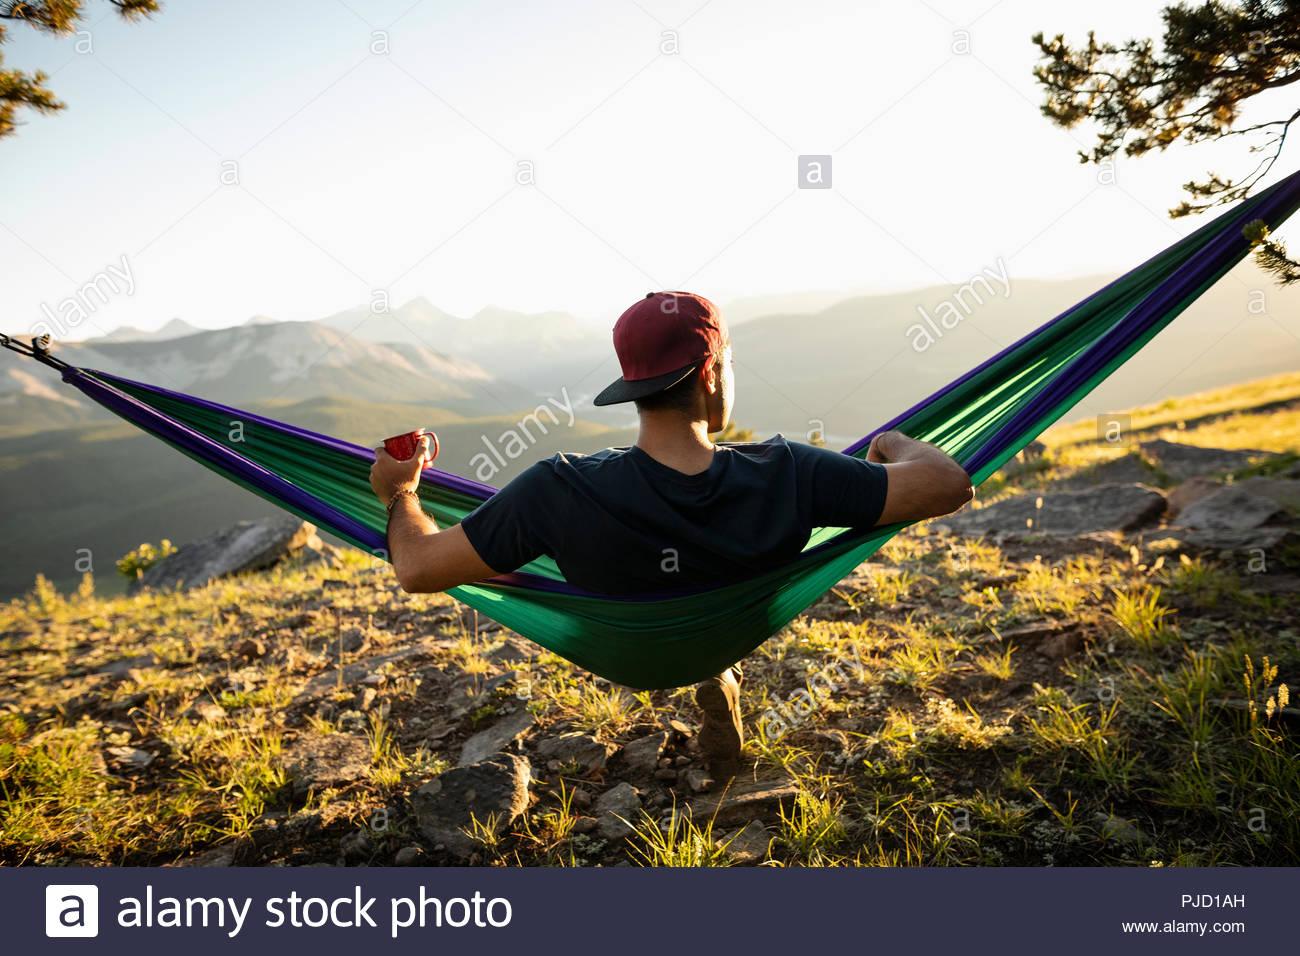 Serene man drinking coffee in sunny hammock with idyllic mountain view, Alberta, Canada - Stock Image